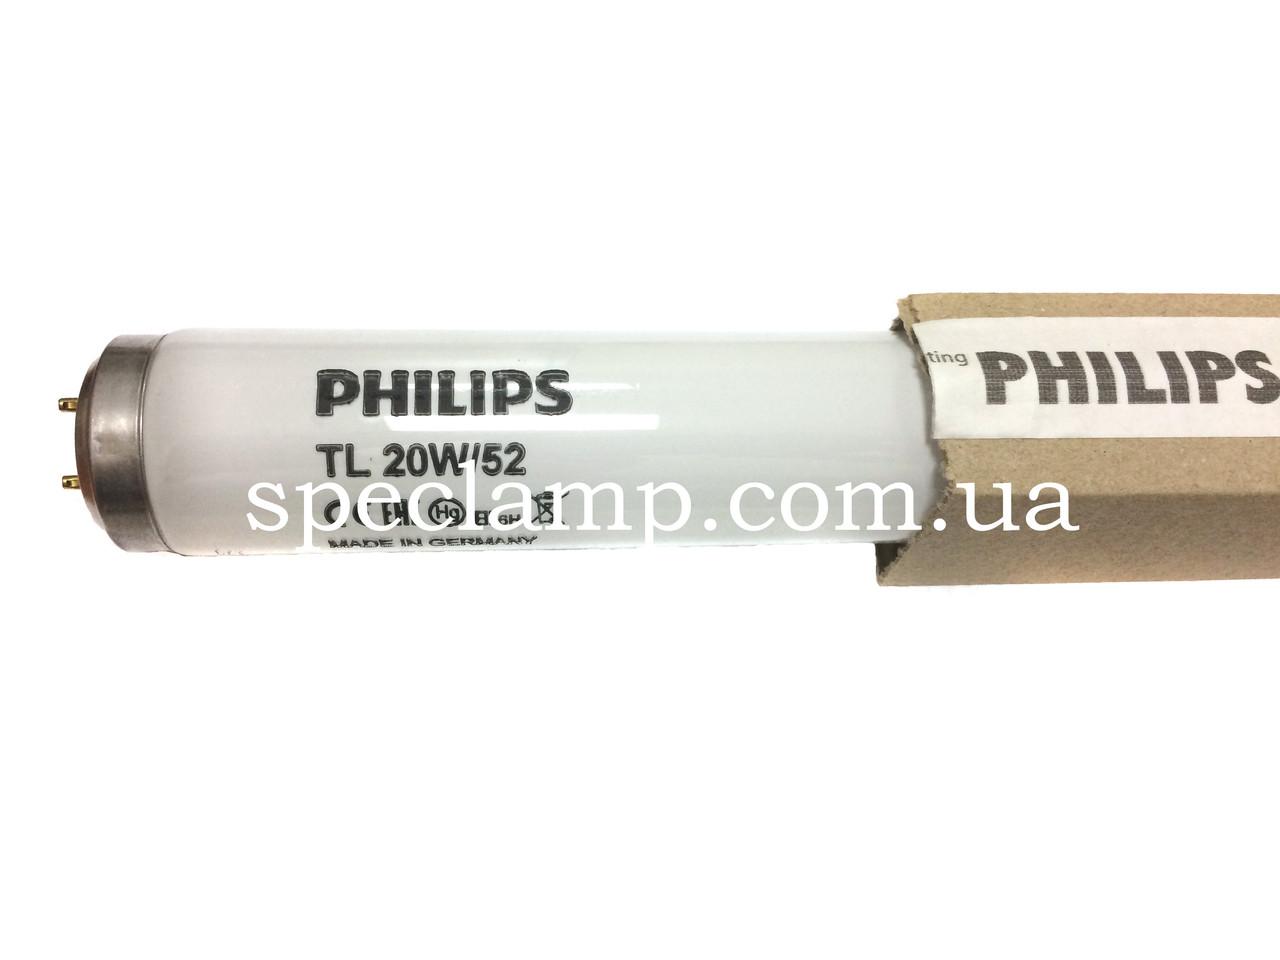 Лампа PHILIPS TL 20W/52 G13 для лечения желтухи